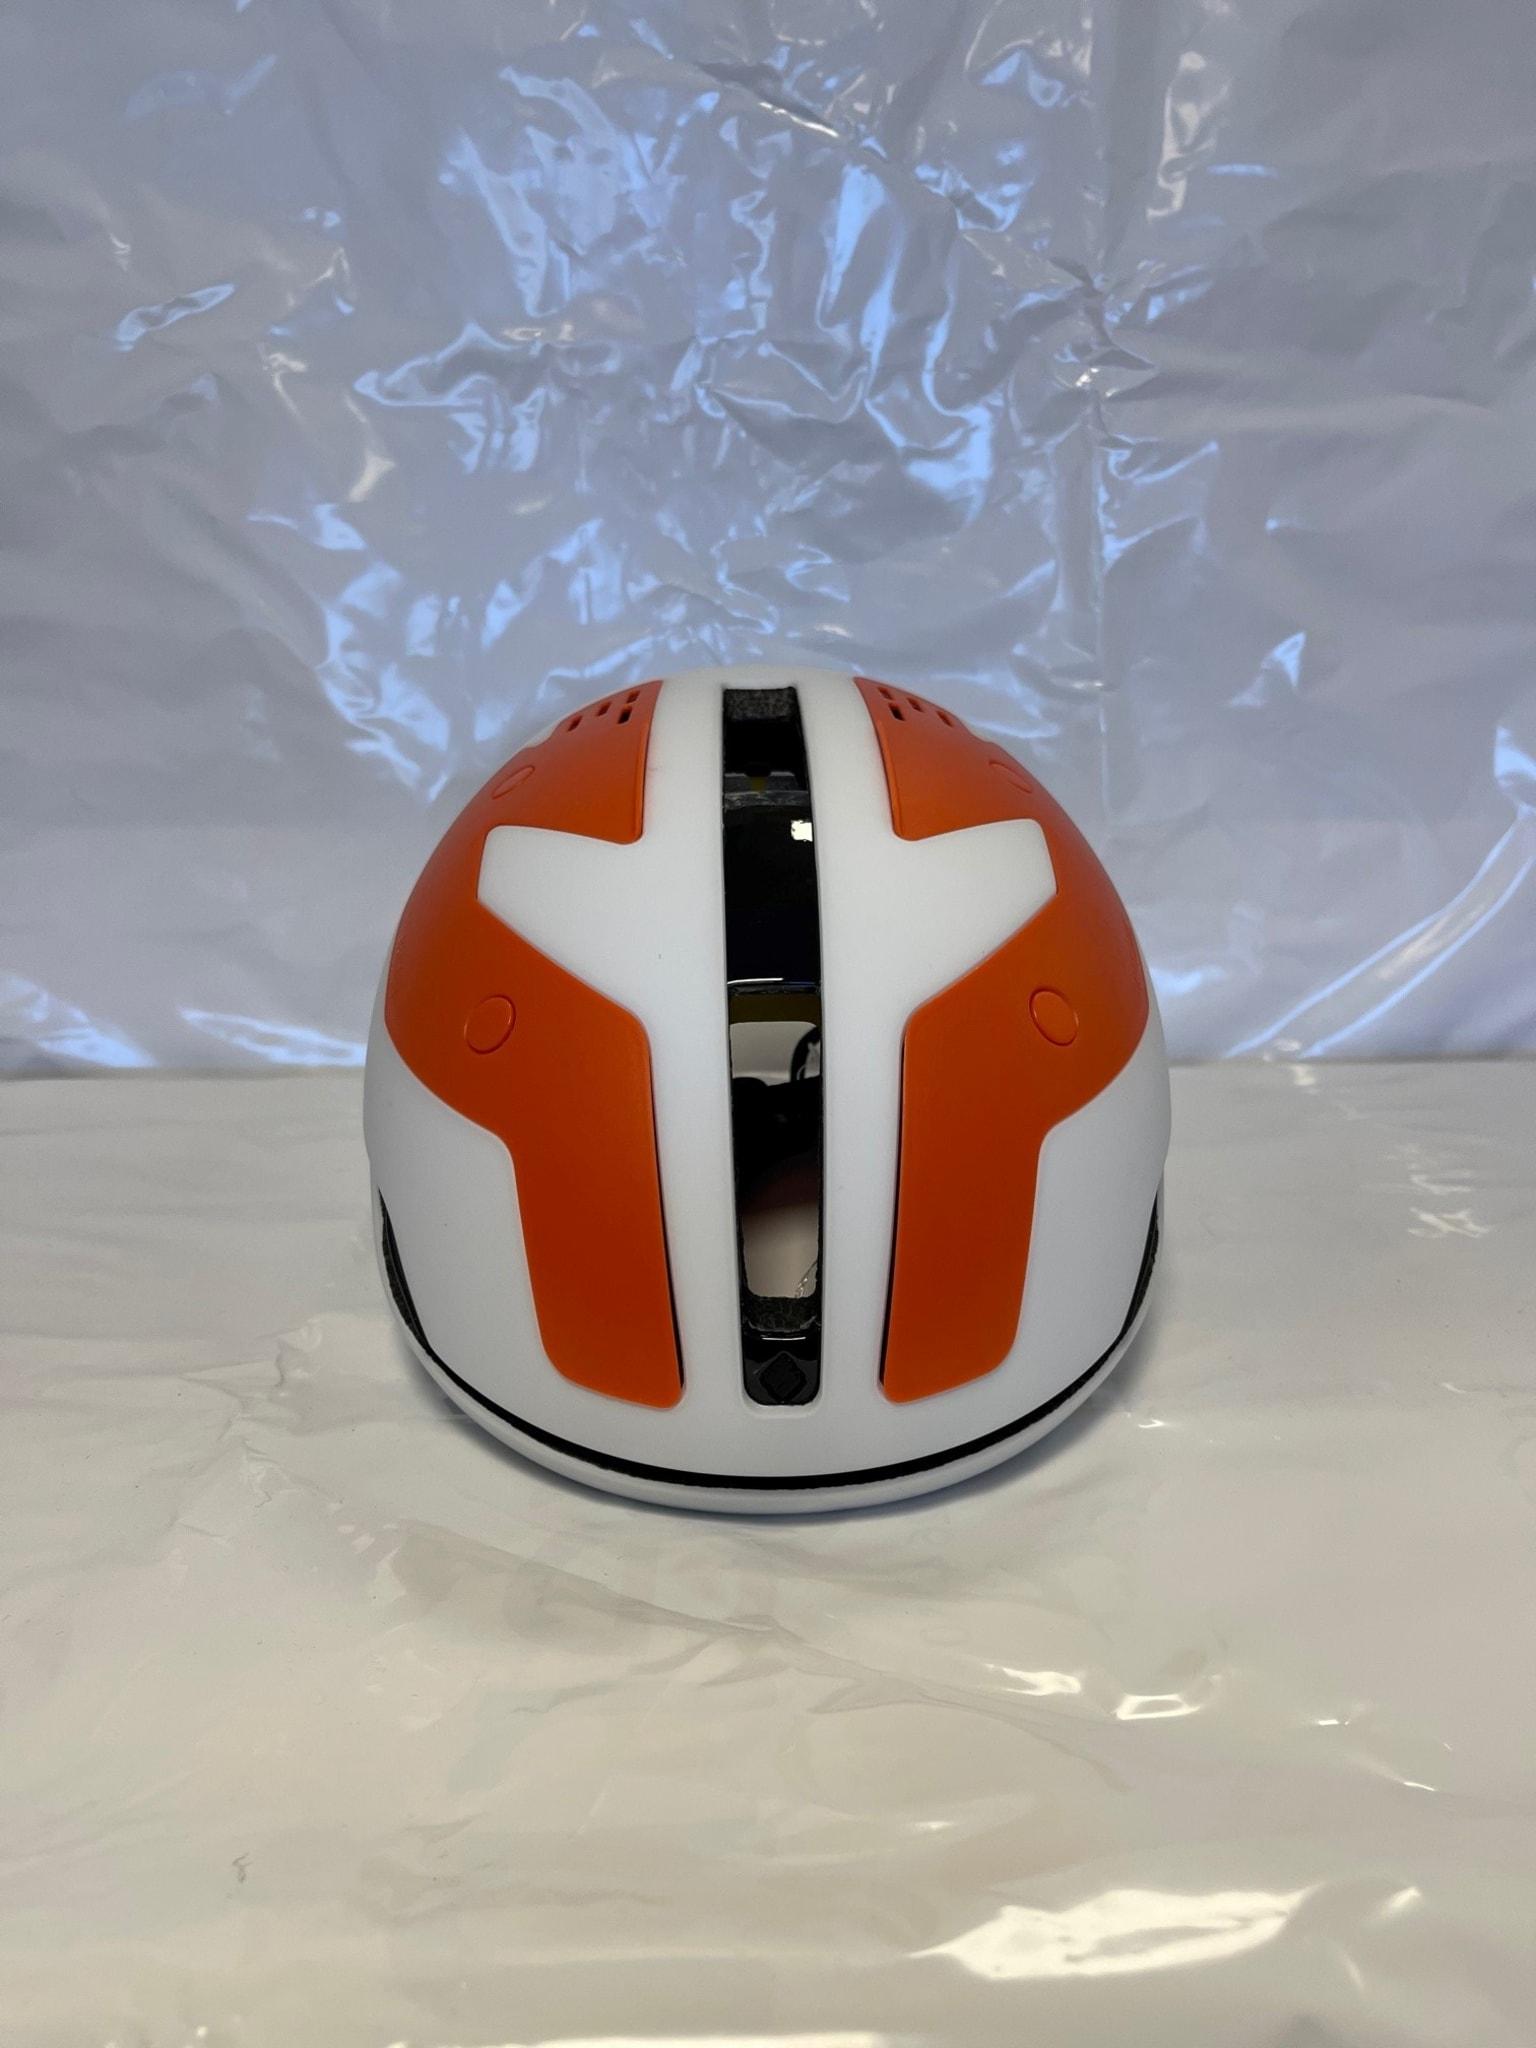 Falconer II Aero MIPS er Sweet Protections topphjelm for landeveissykling.